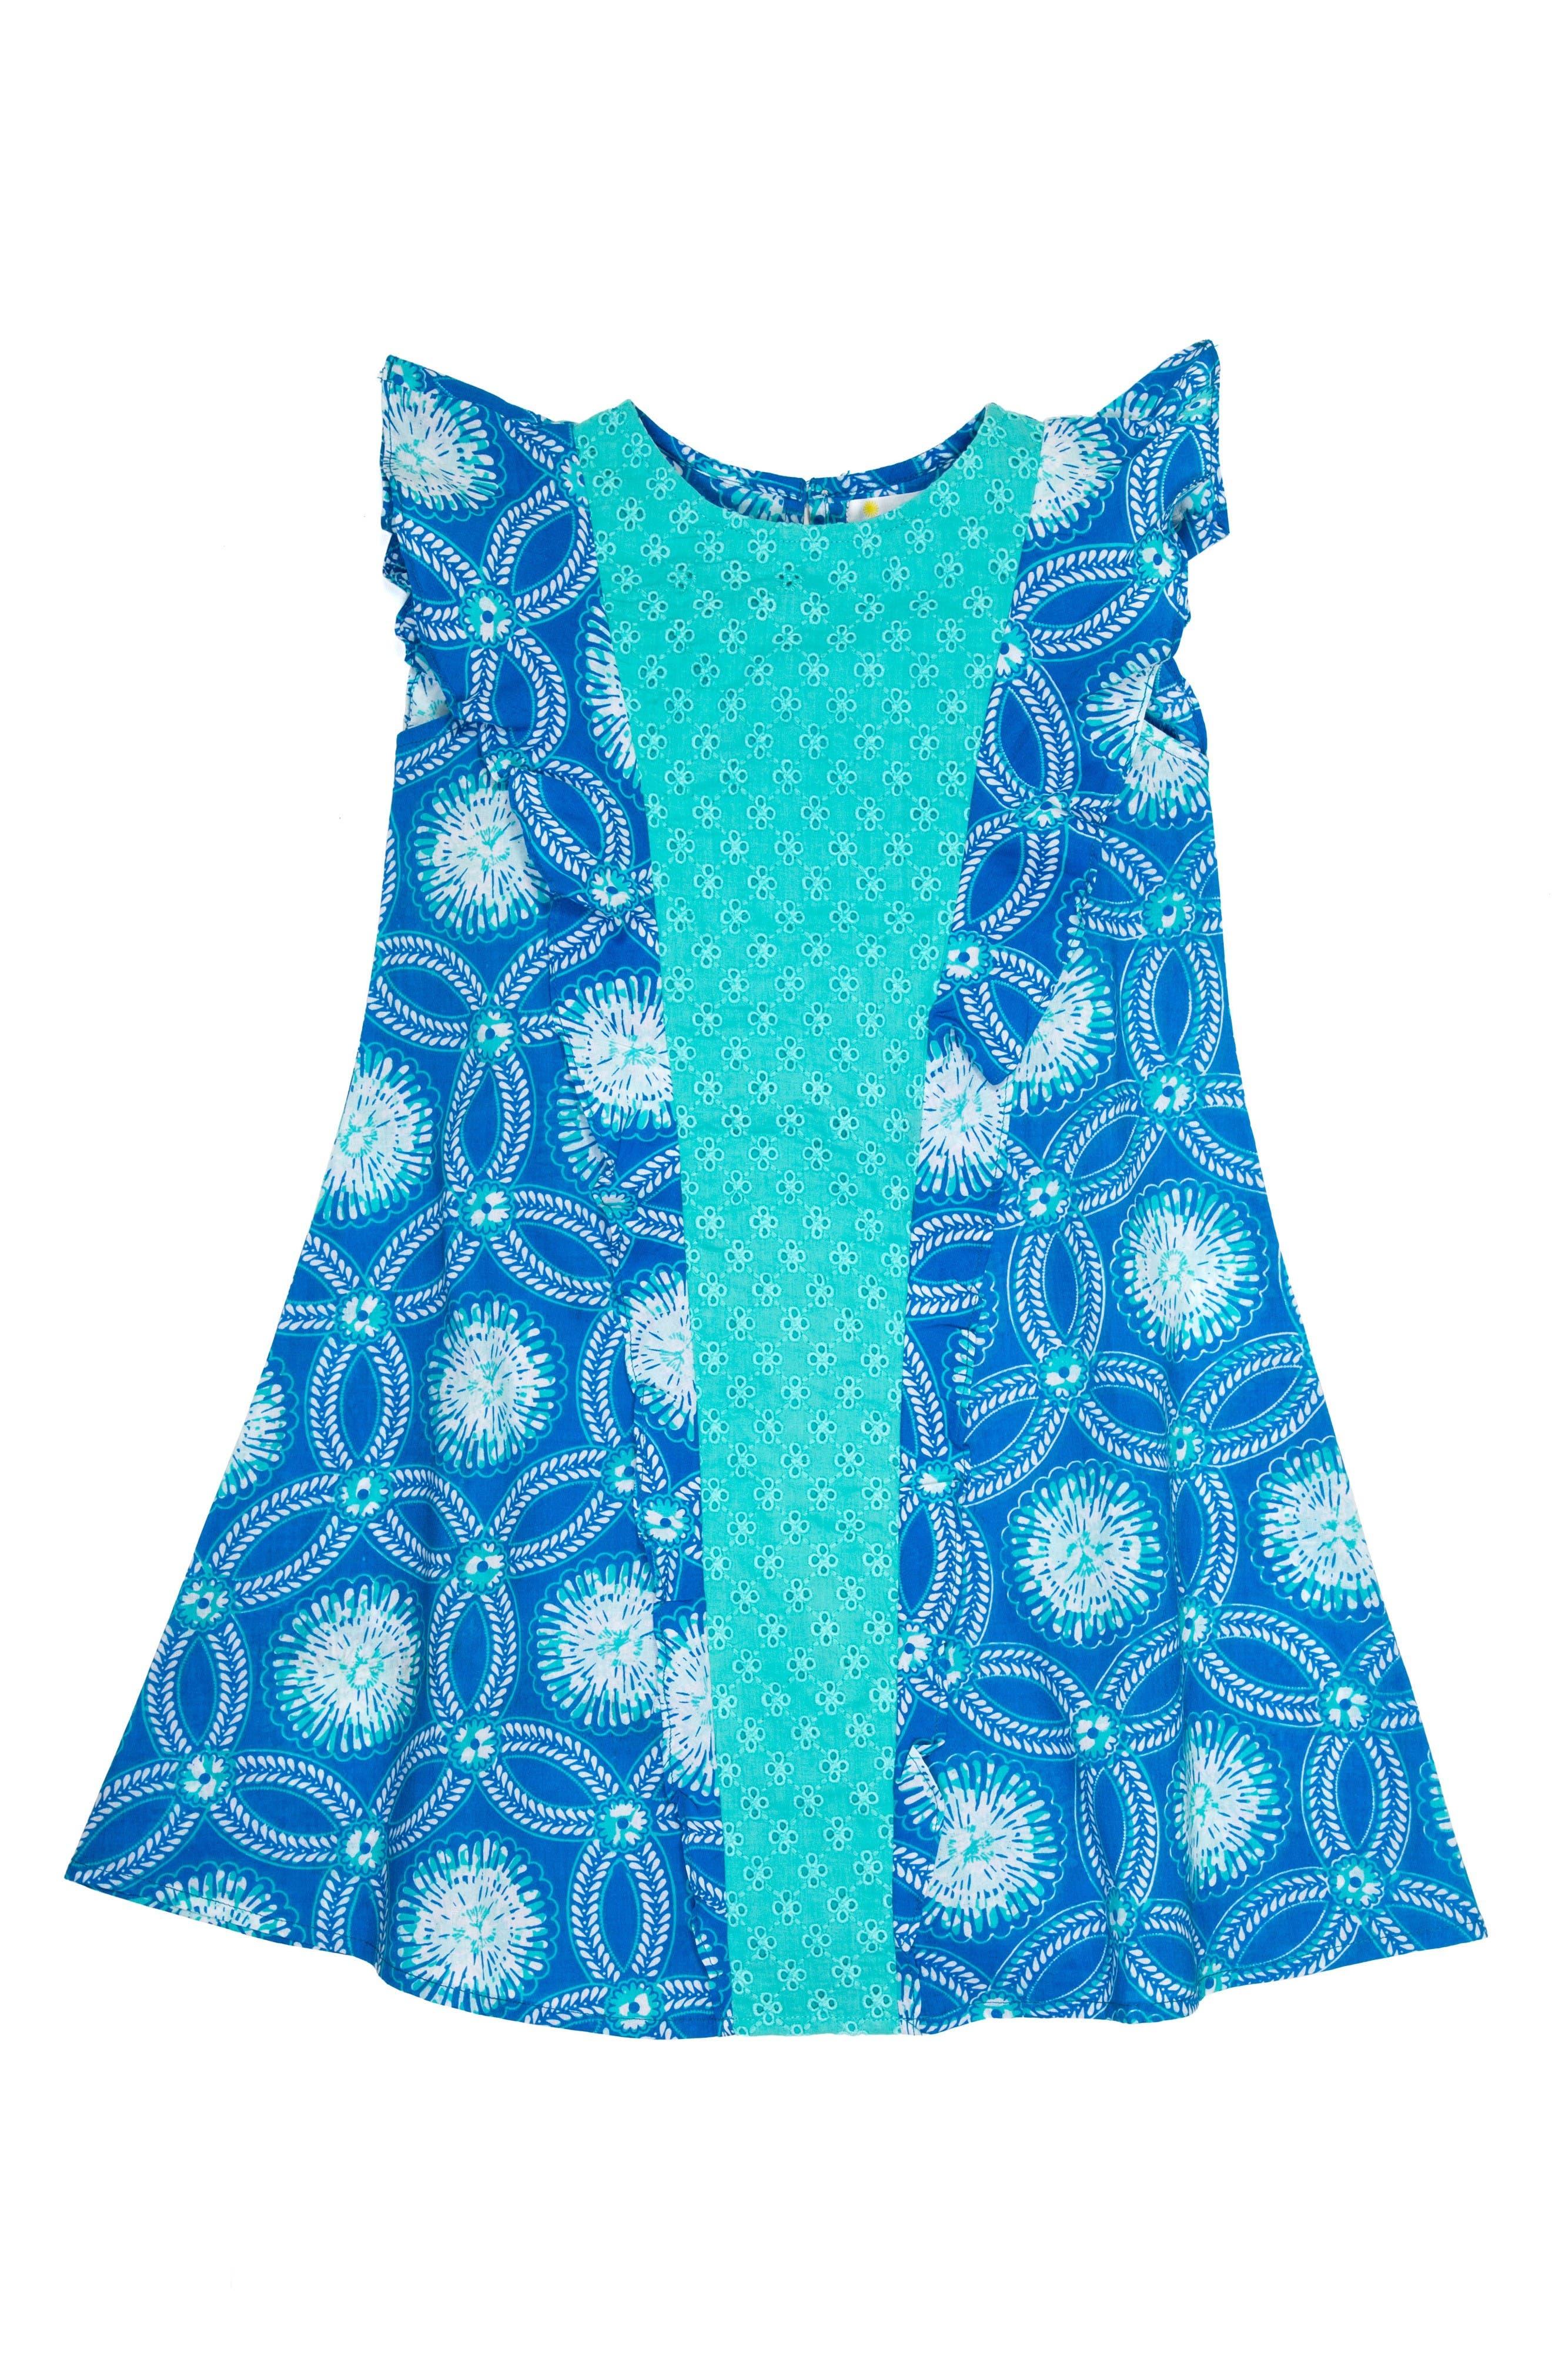 Main Image - Masala Baby Bali Ruffle Dress (Toddler Girls, Little Girls & Big Girls)